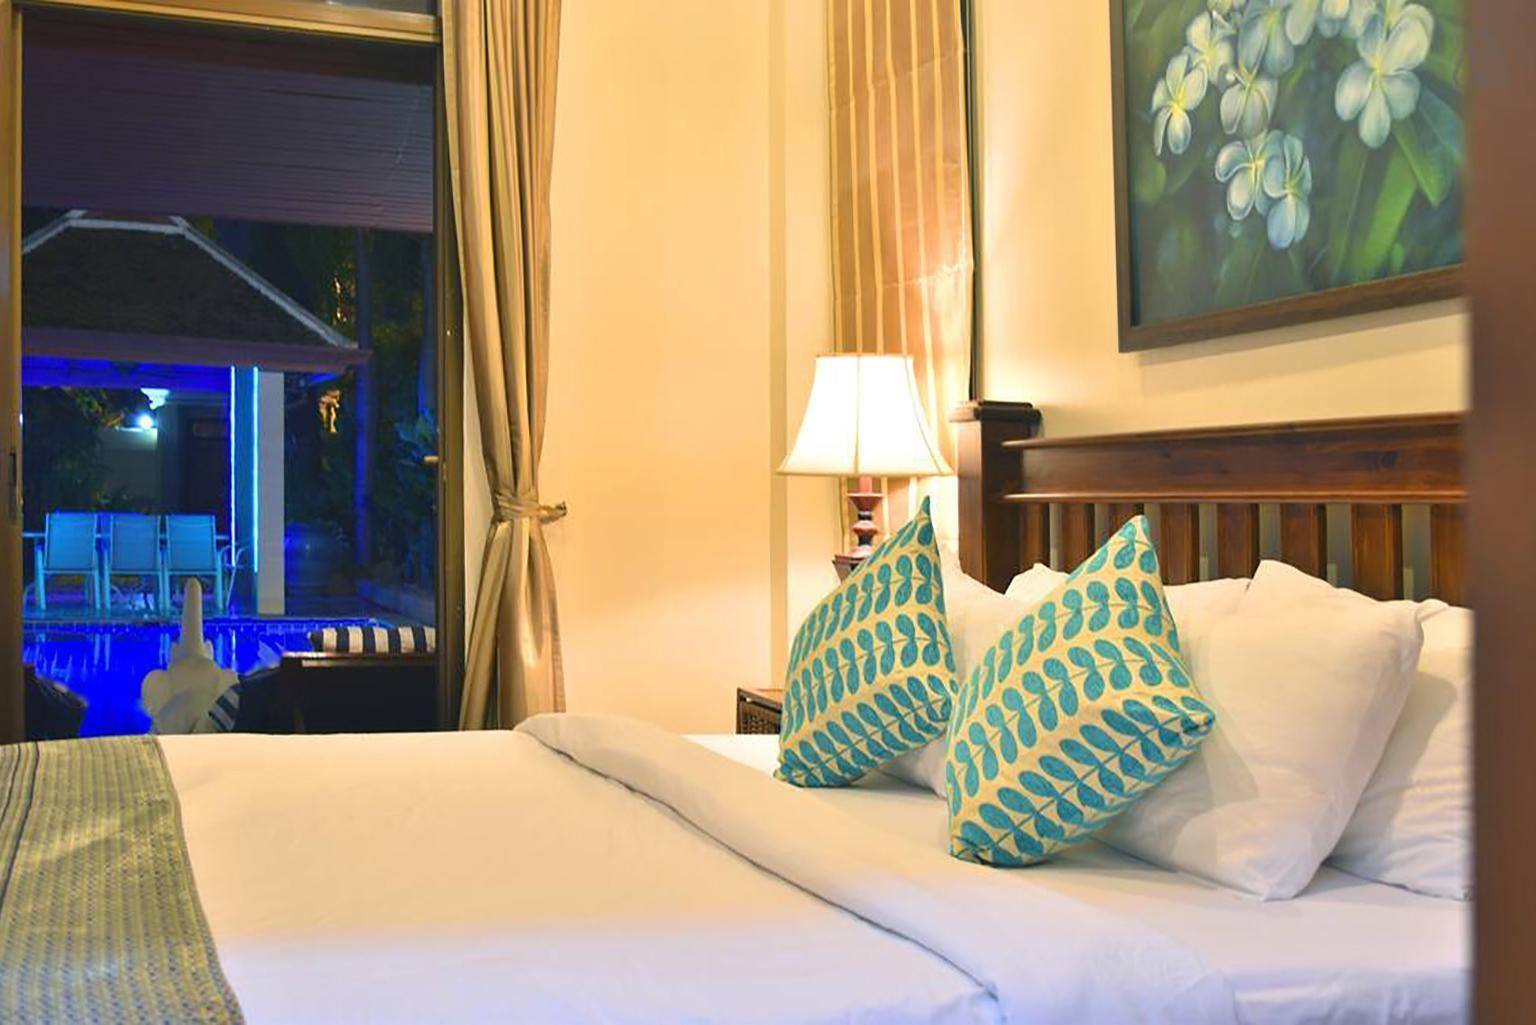 4 Bed Villa Private Pool and BBQ Jomtien Beach วิลลา 4 ห้องนอน 4 ห้องน้ำส่วนตัว ขนาด 588 ตร.ม. – หาดจอมเทียน